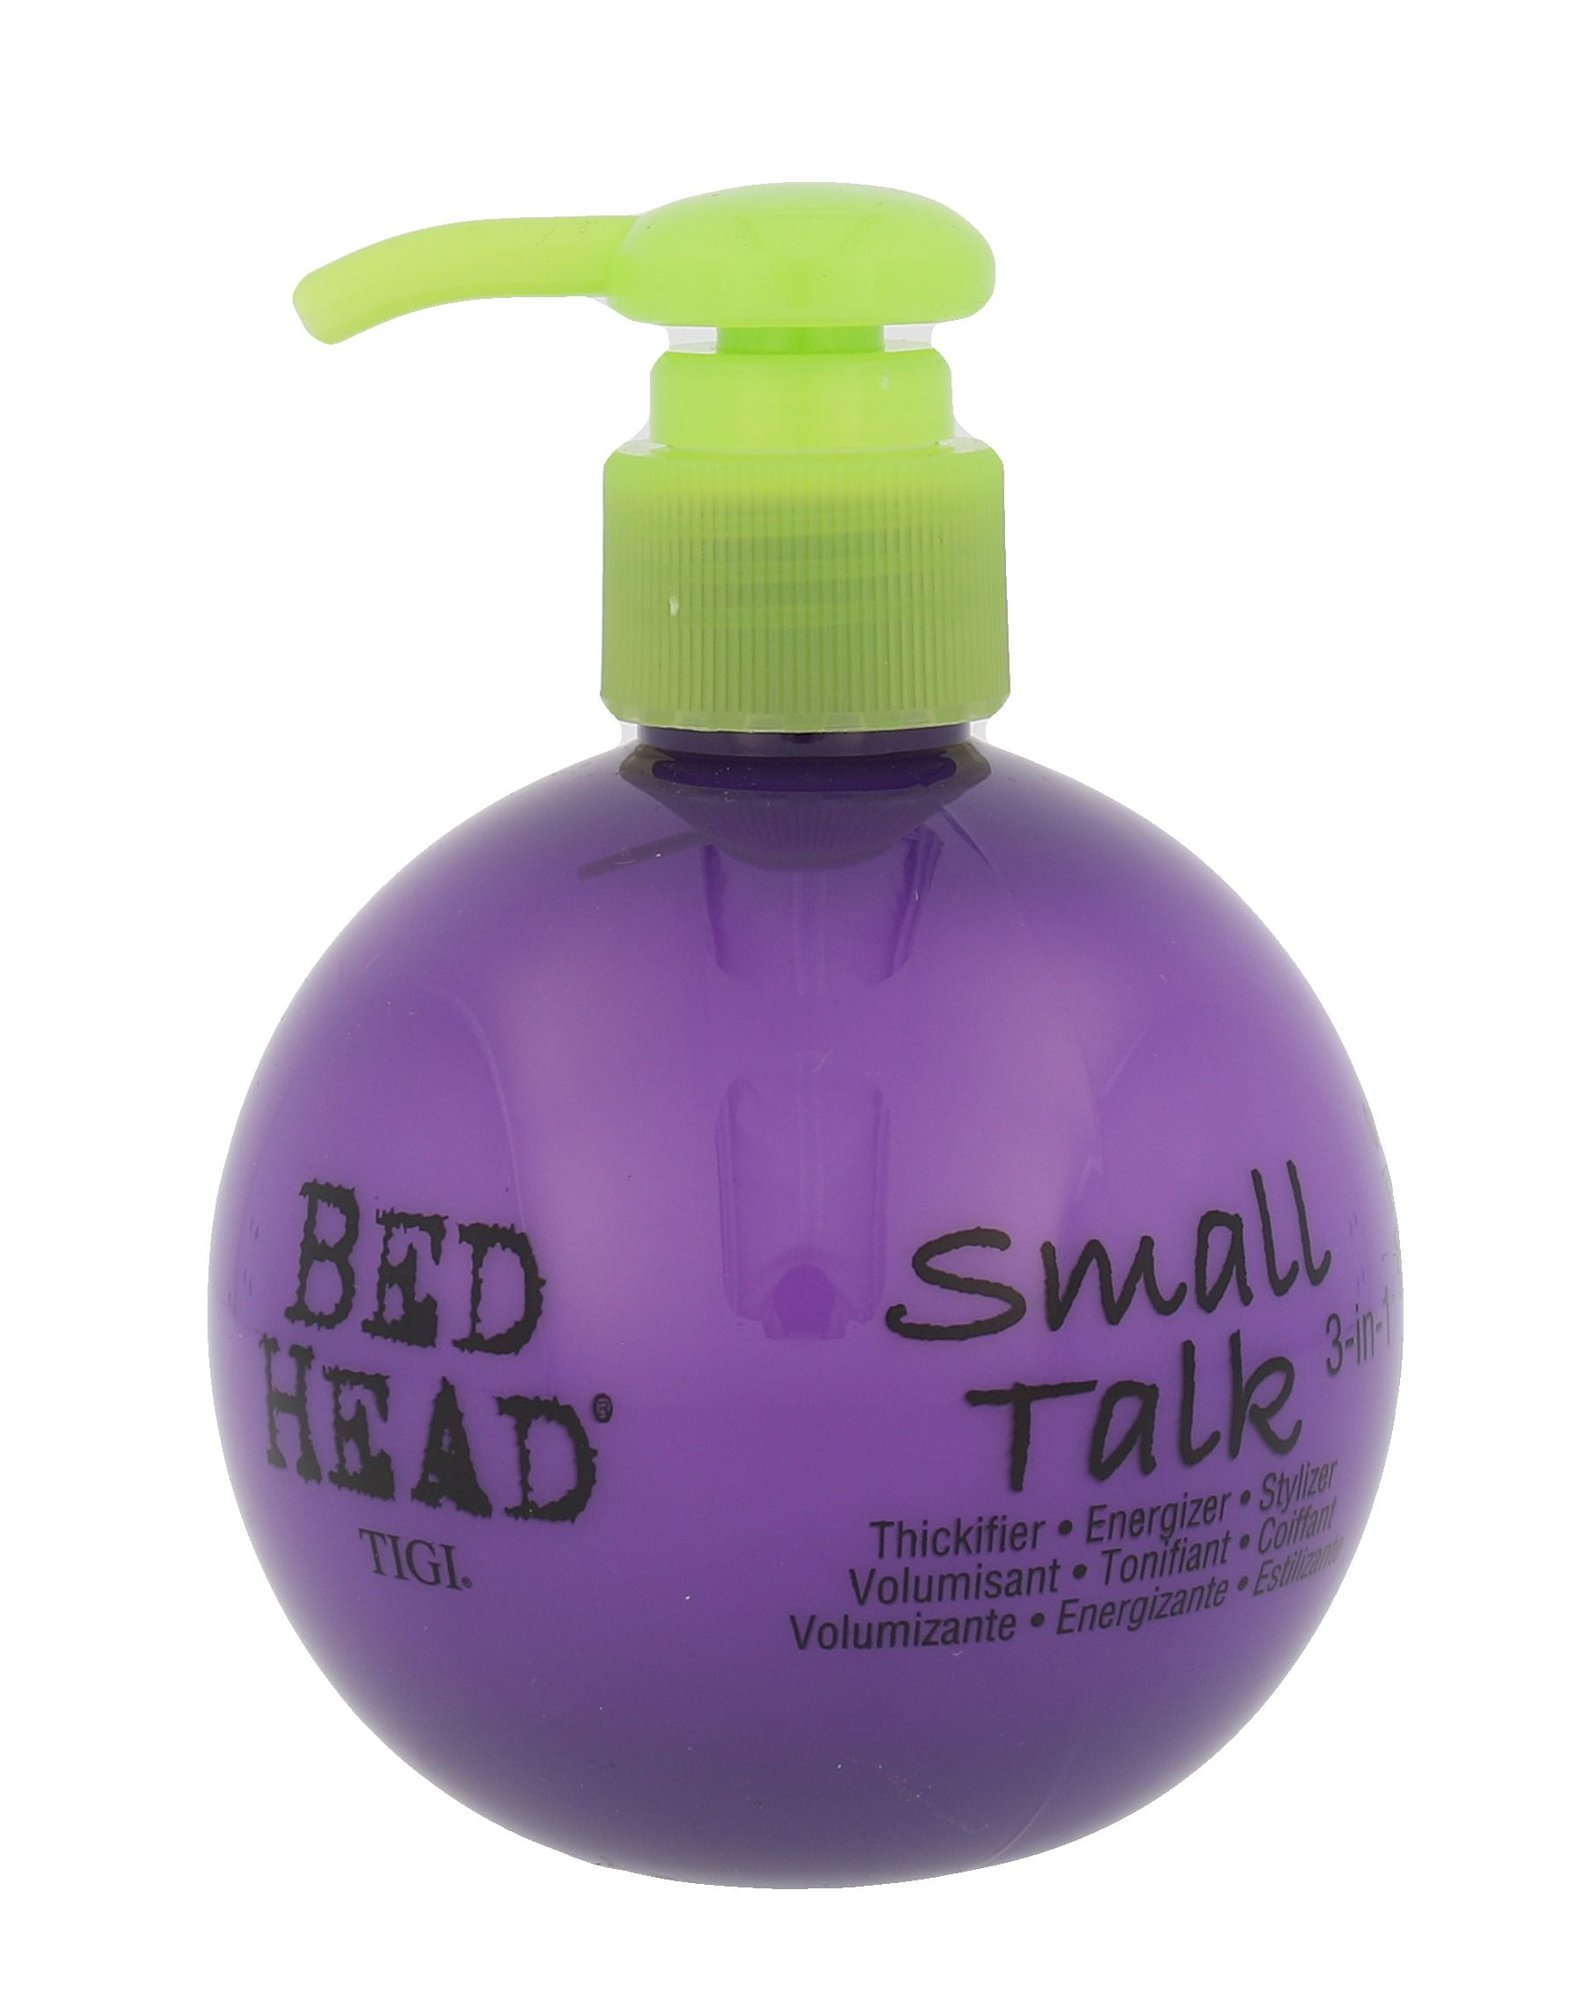 Tigi Bed Head Small Talk Cosmetic 200ml